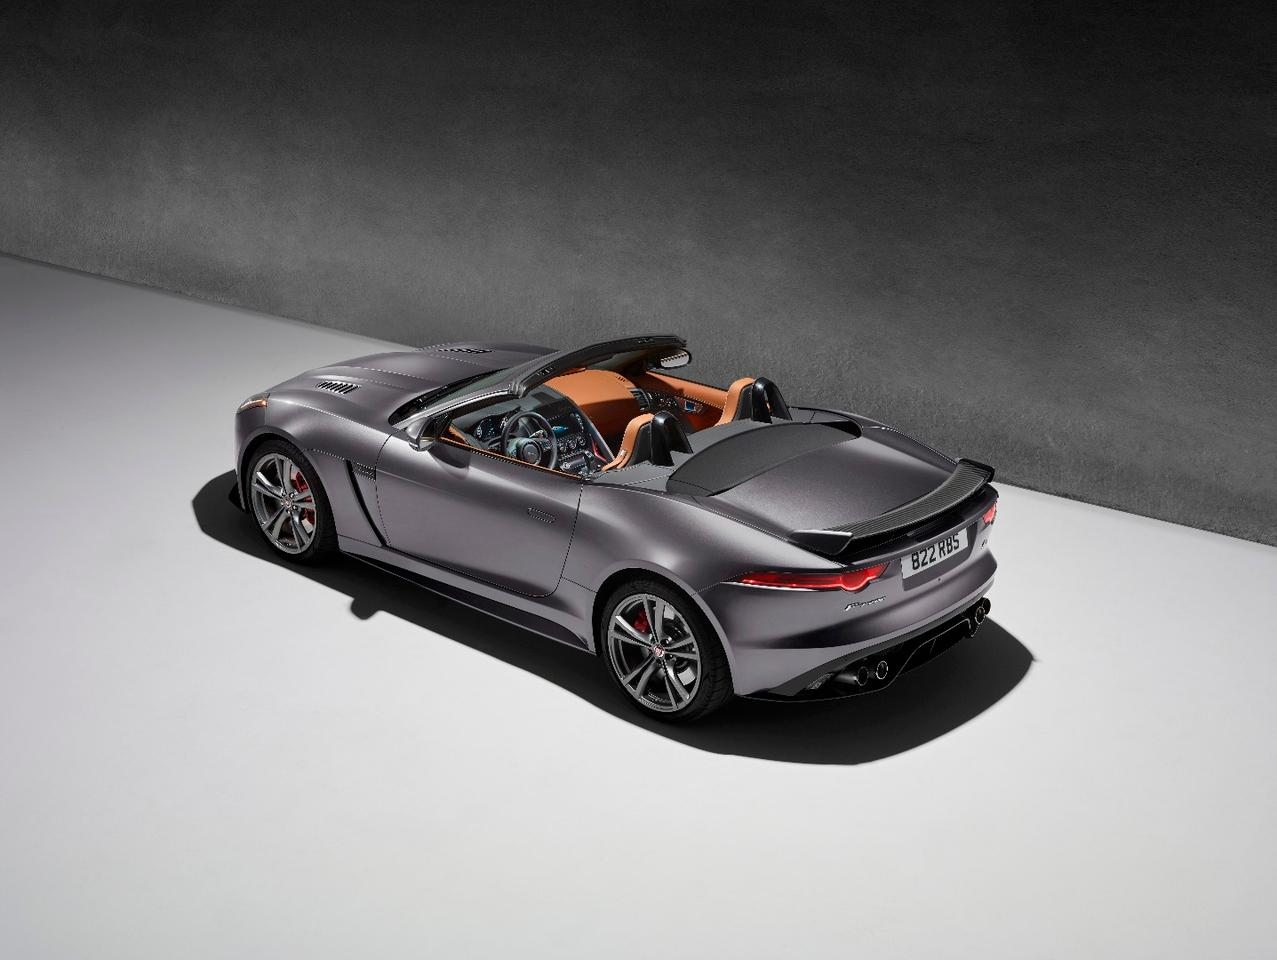 The Jaguar F-Type SVR shown as a convertible